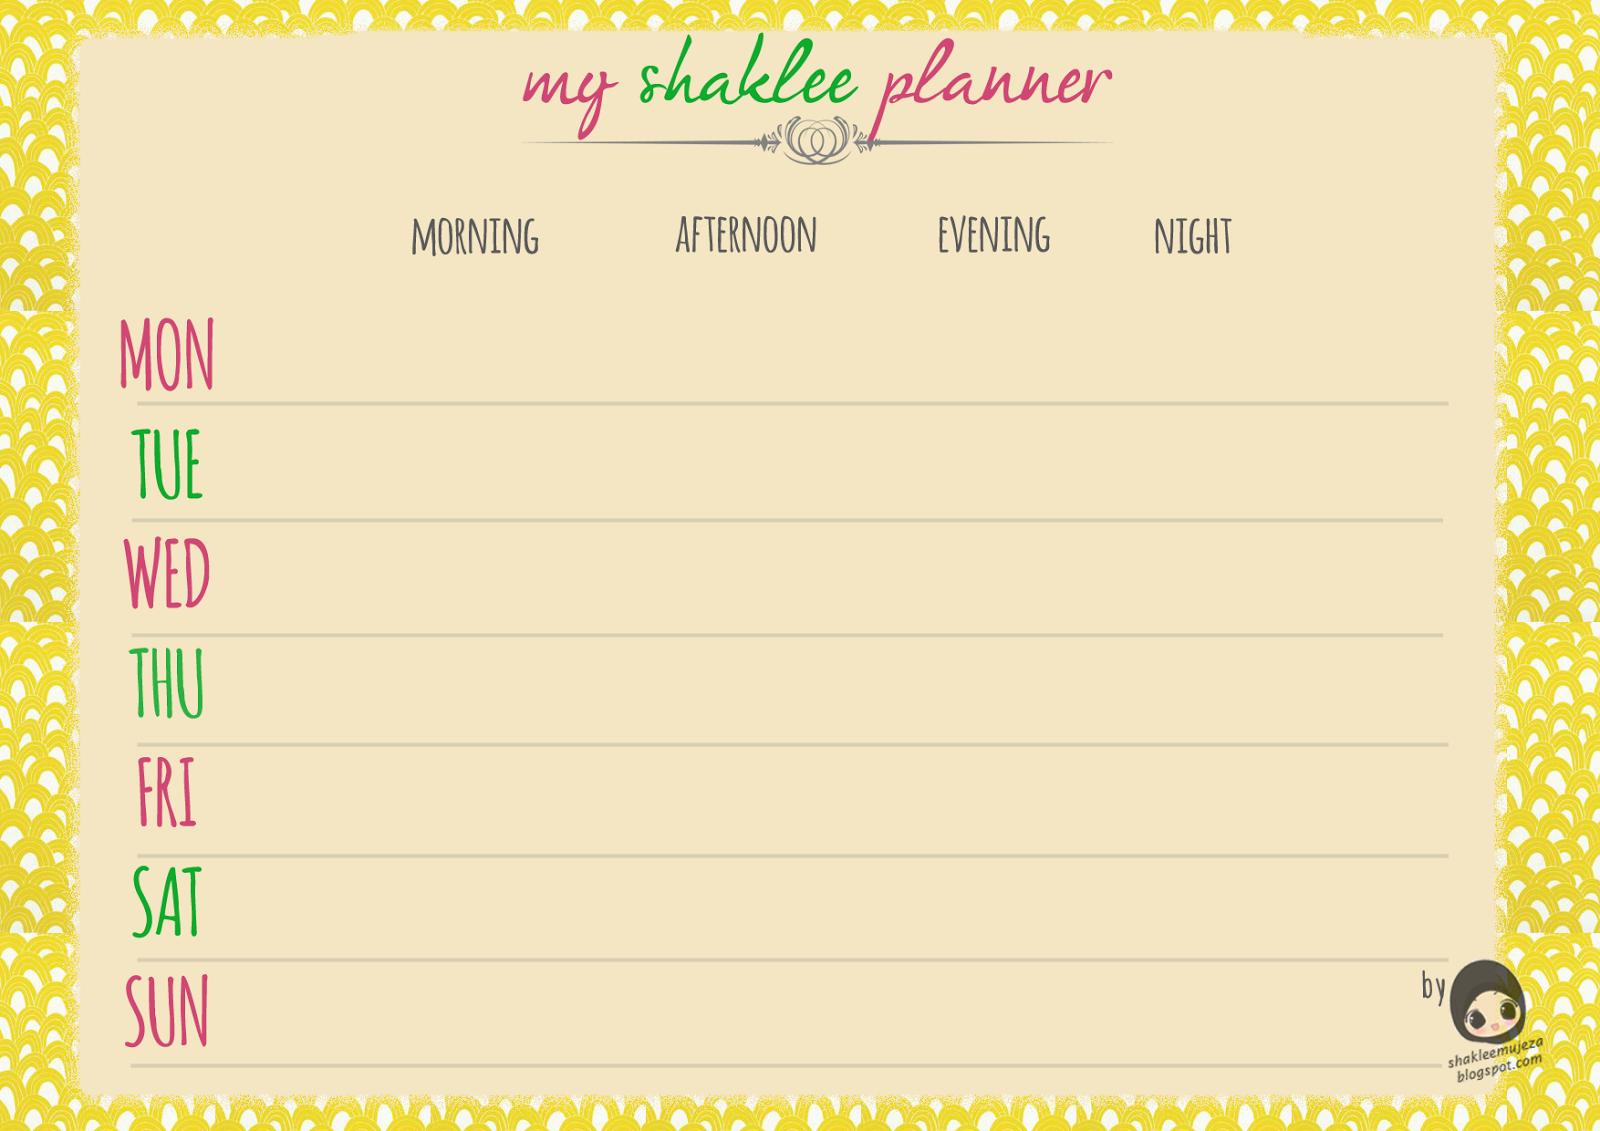 Free Download Shaklee Planner